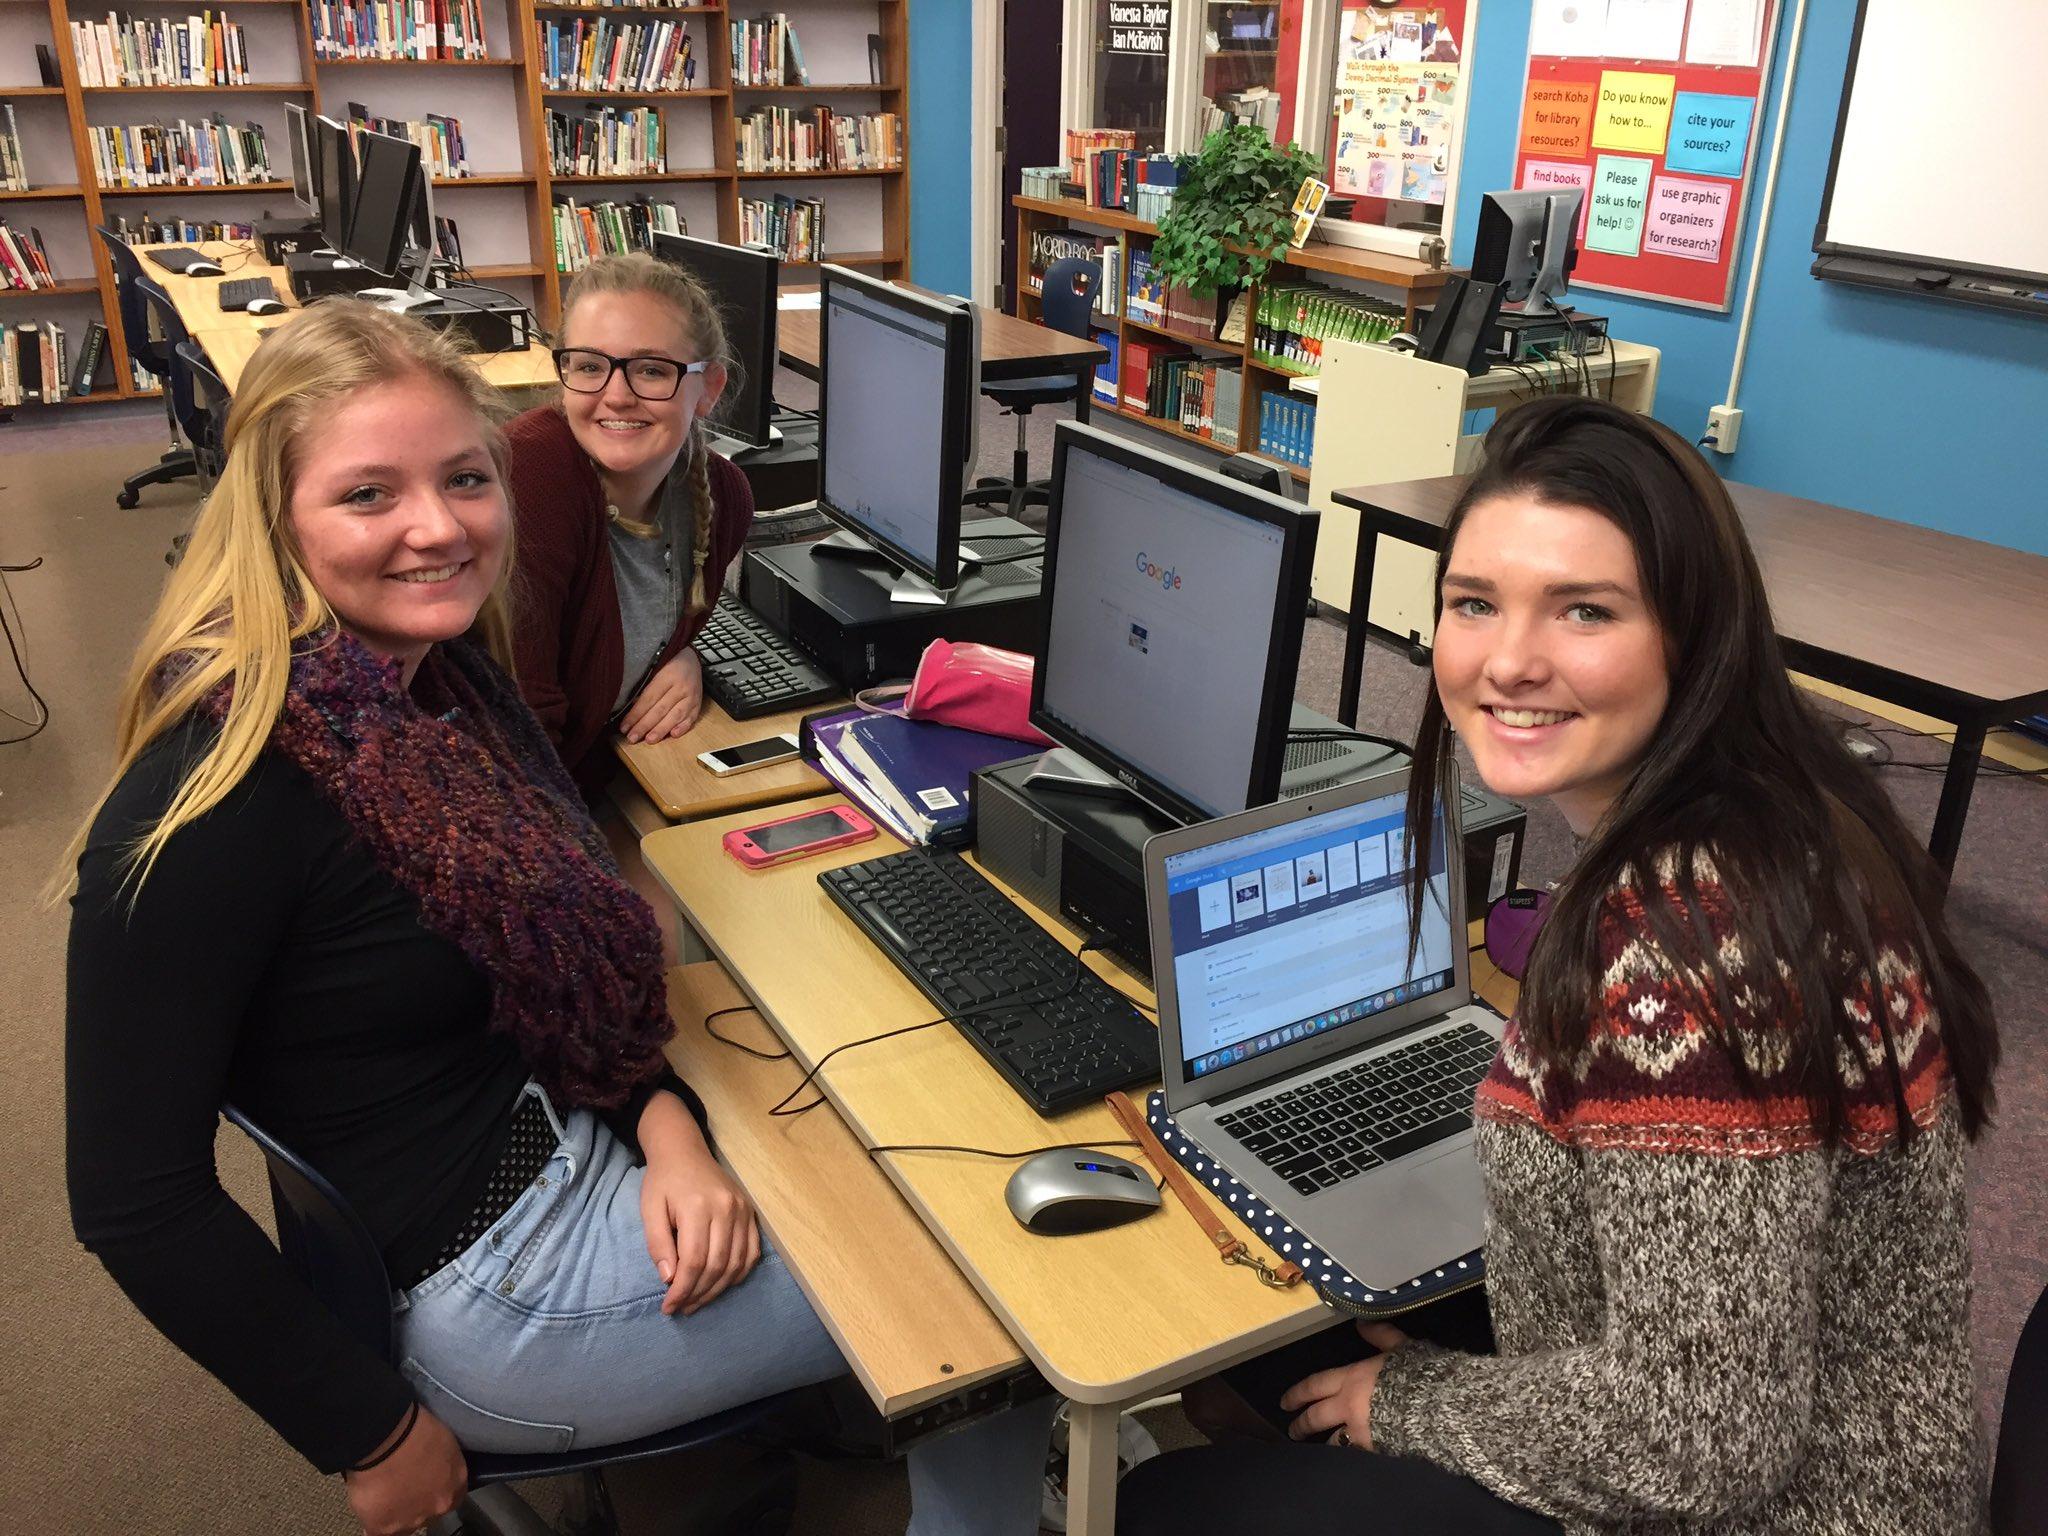 Senior students collaborating on Spare. #tldsblearns @HuntsvilleHS @HHSLibrary1 https://t.co/lISxZySIlp